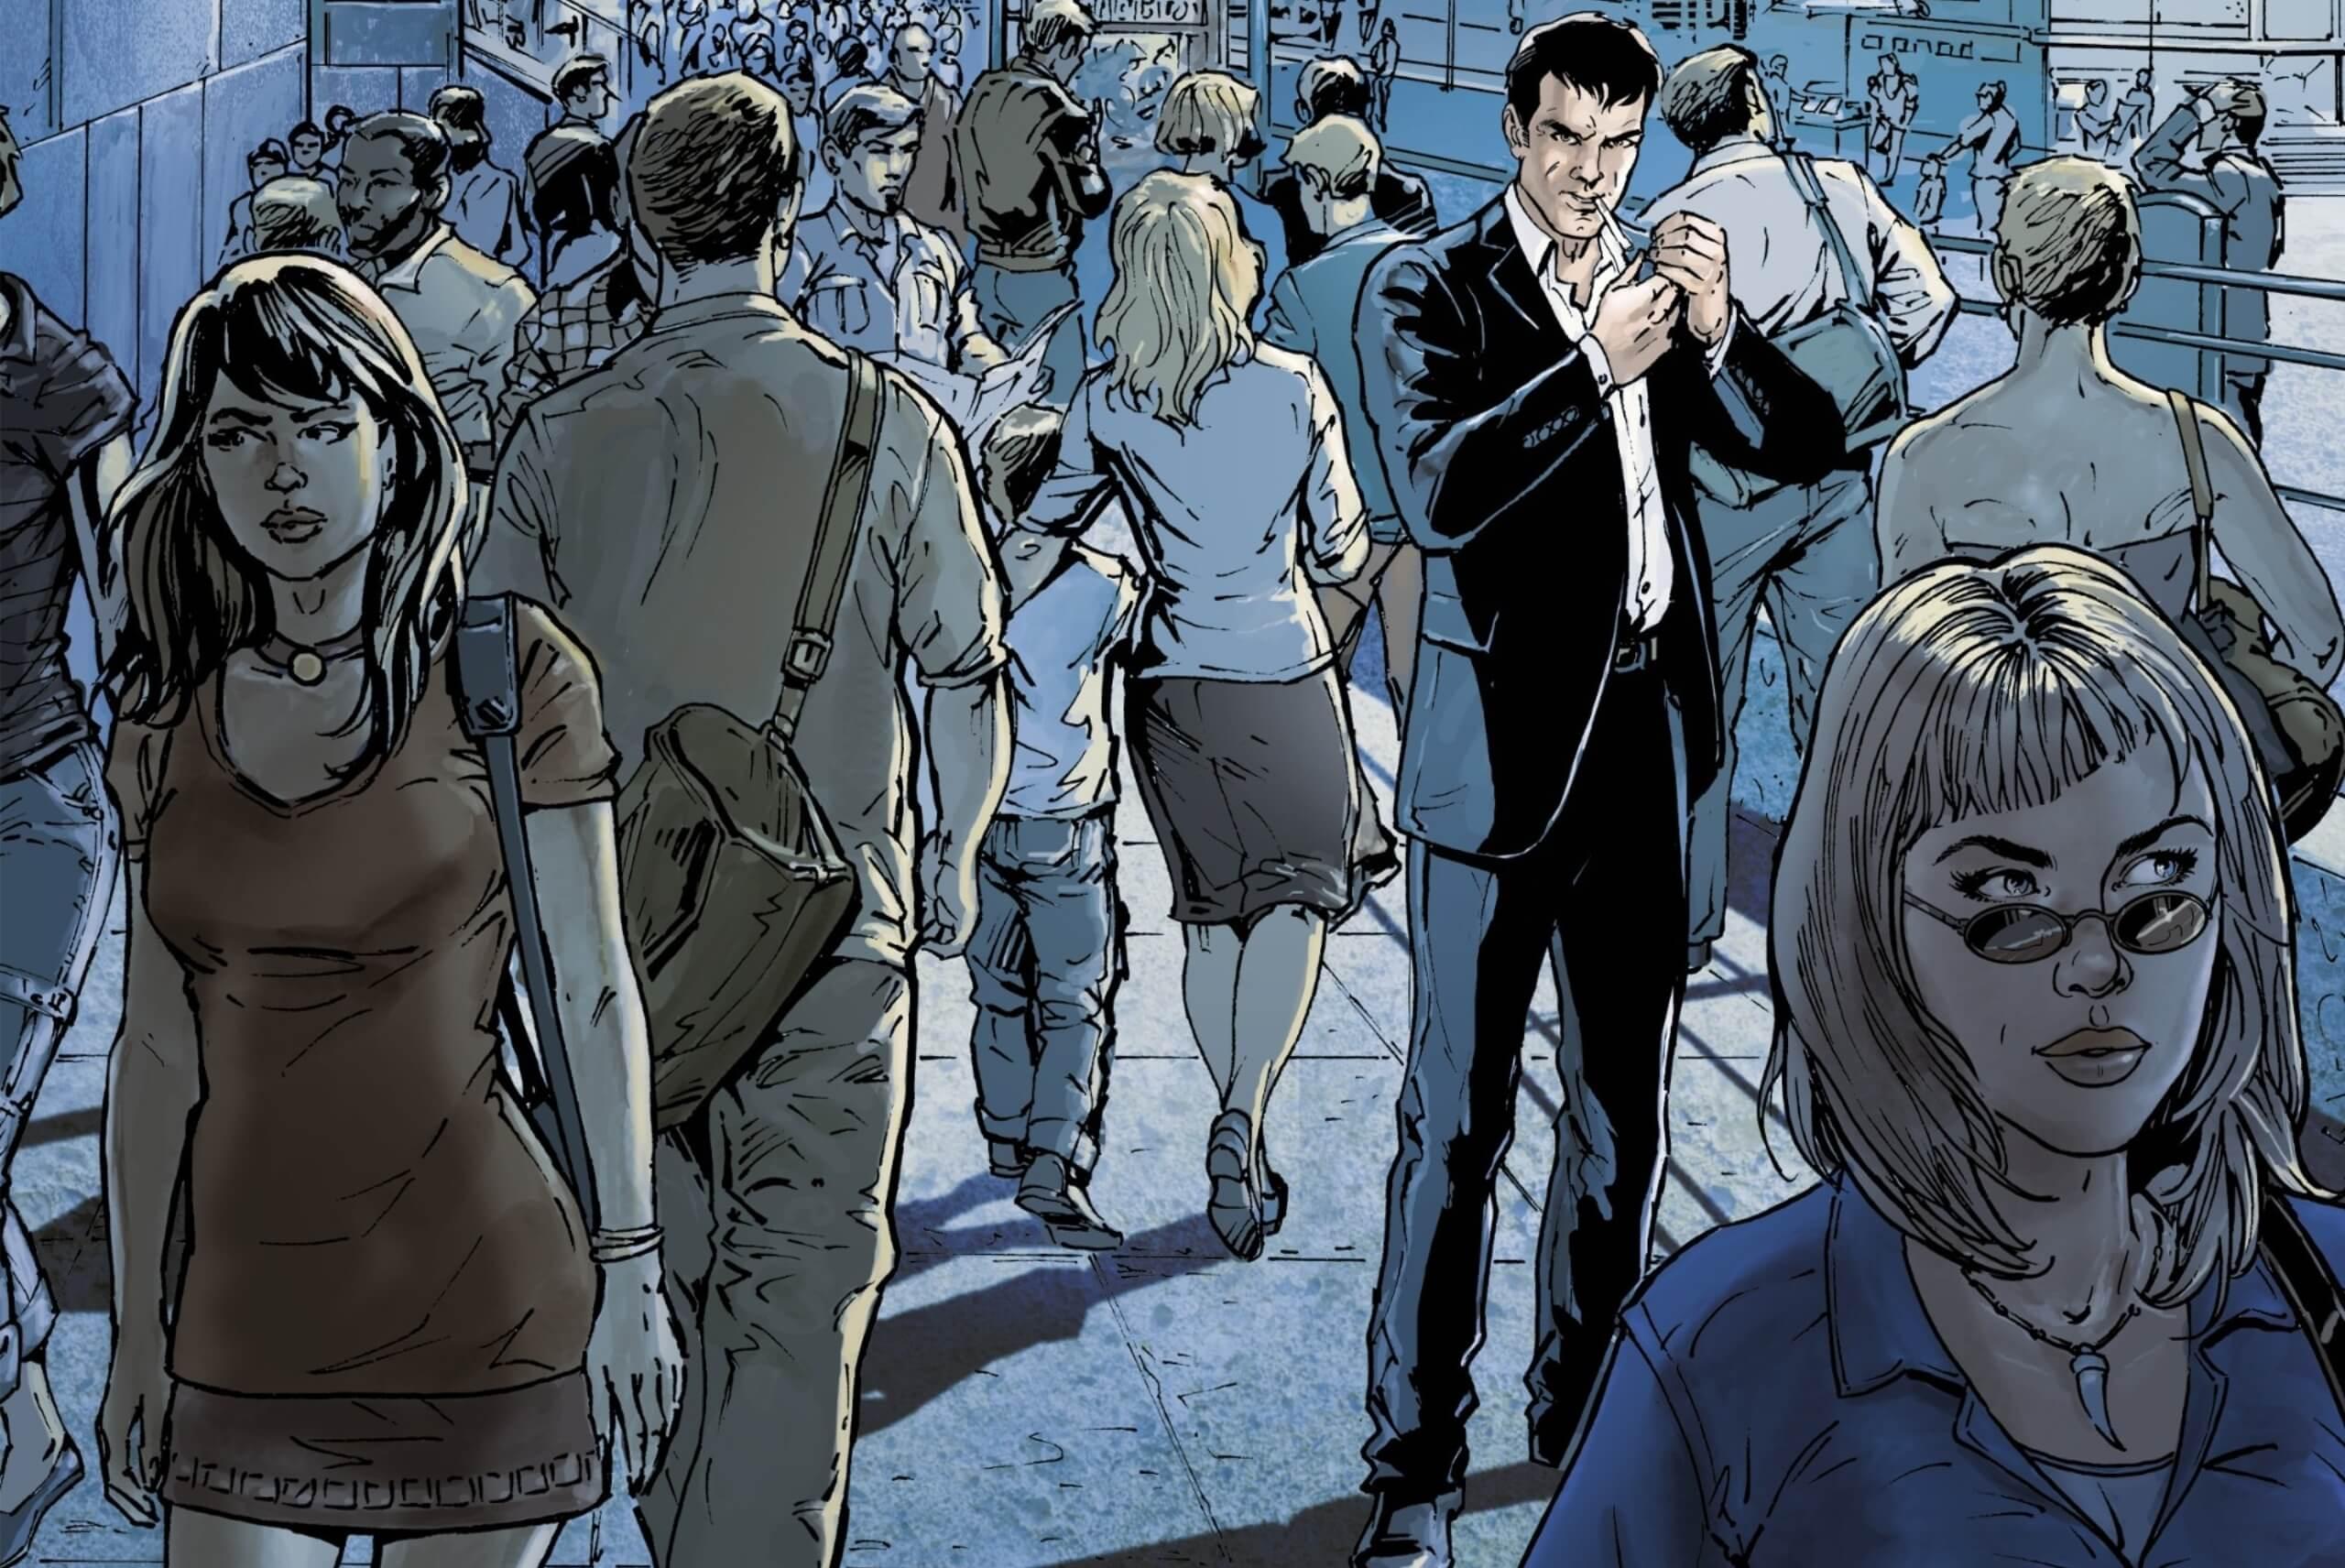 One Volume 1: Just One Breath Cover. Sylvain Cordurié and Živorad Radivojević. Europe Comics. October 2019.